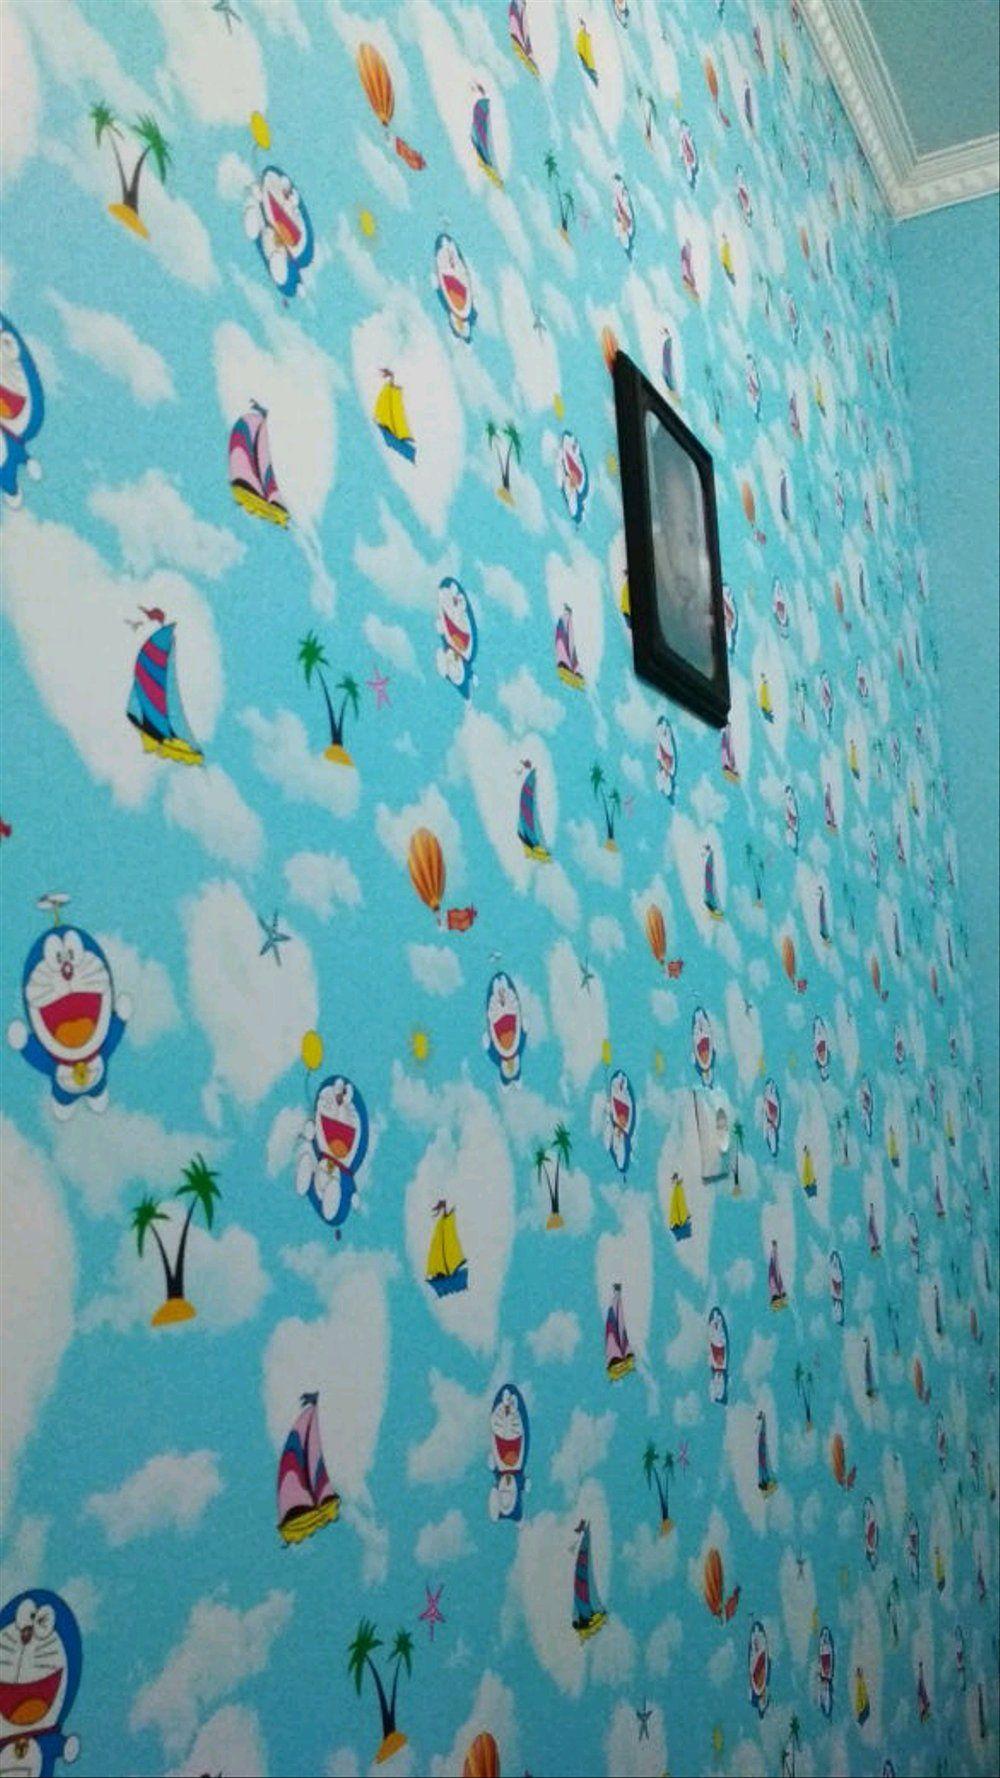 Wallpaper Dinding Doraemon 3d